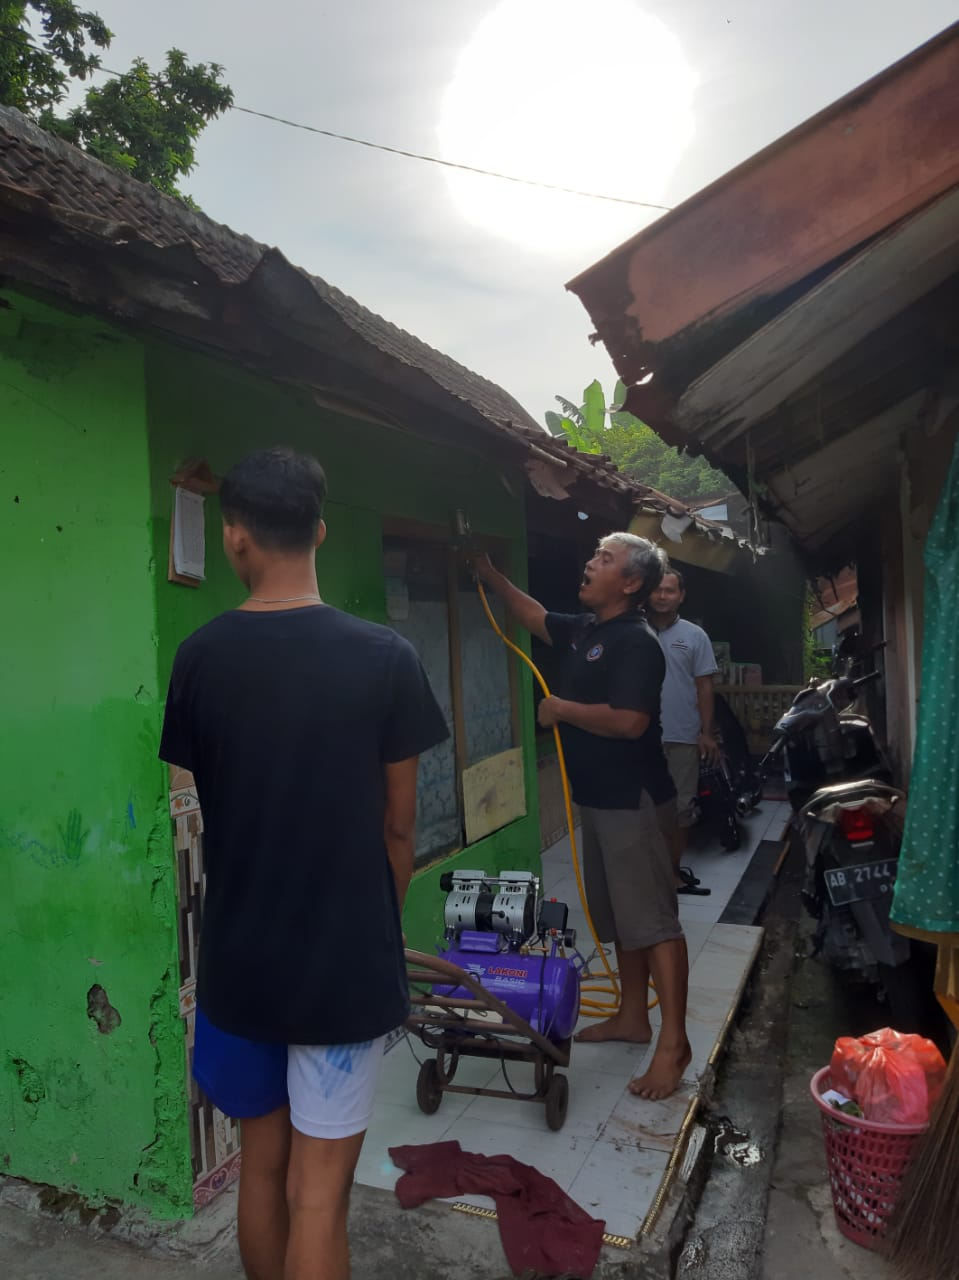 Gerakan Bersih - bersih di wilayah RW Kelurahan Patangpuluhan